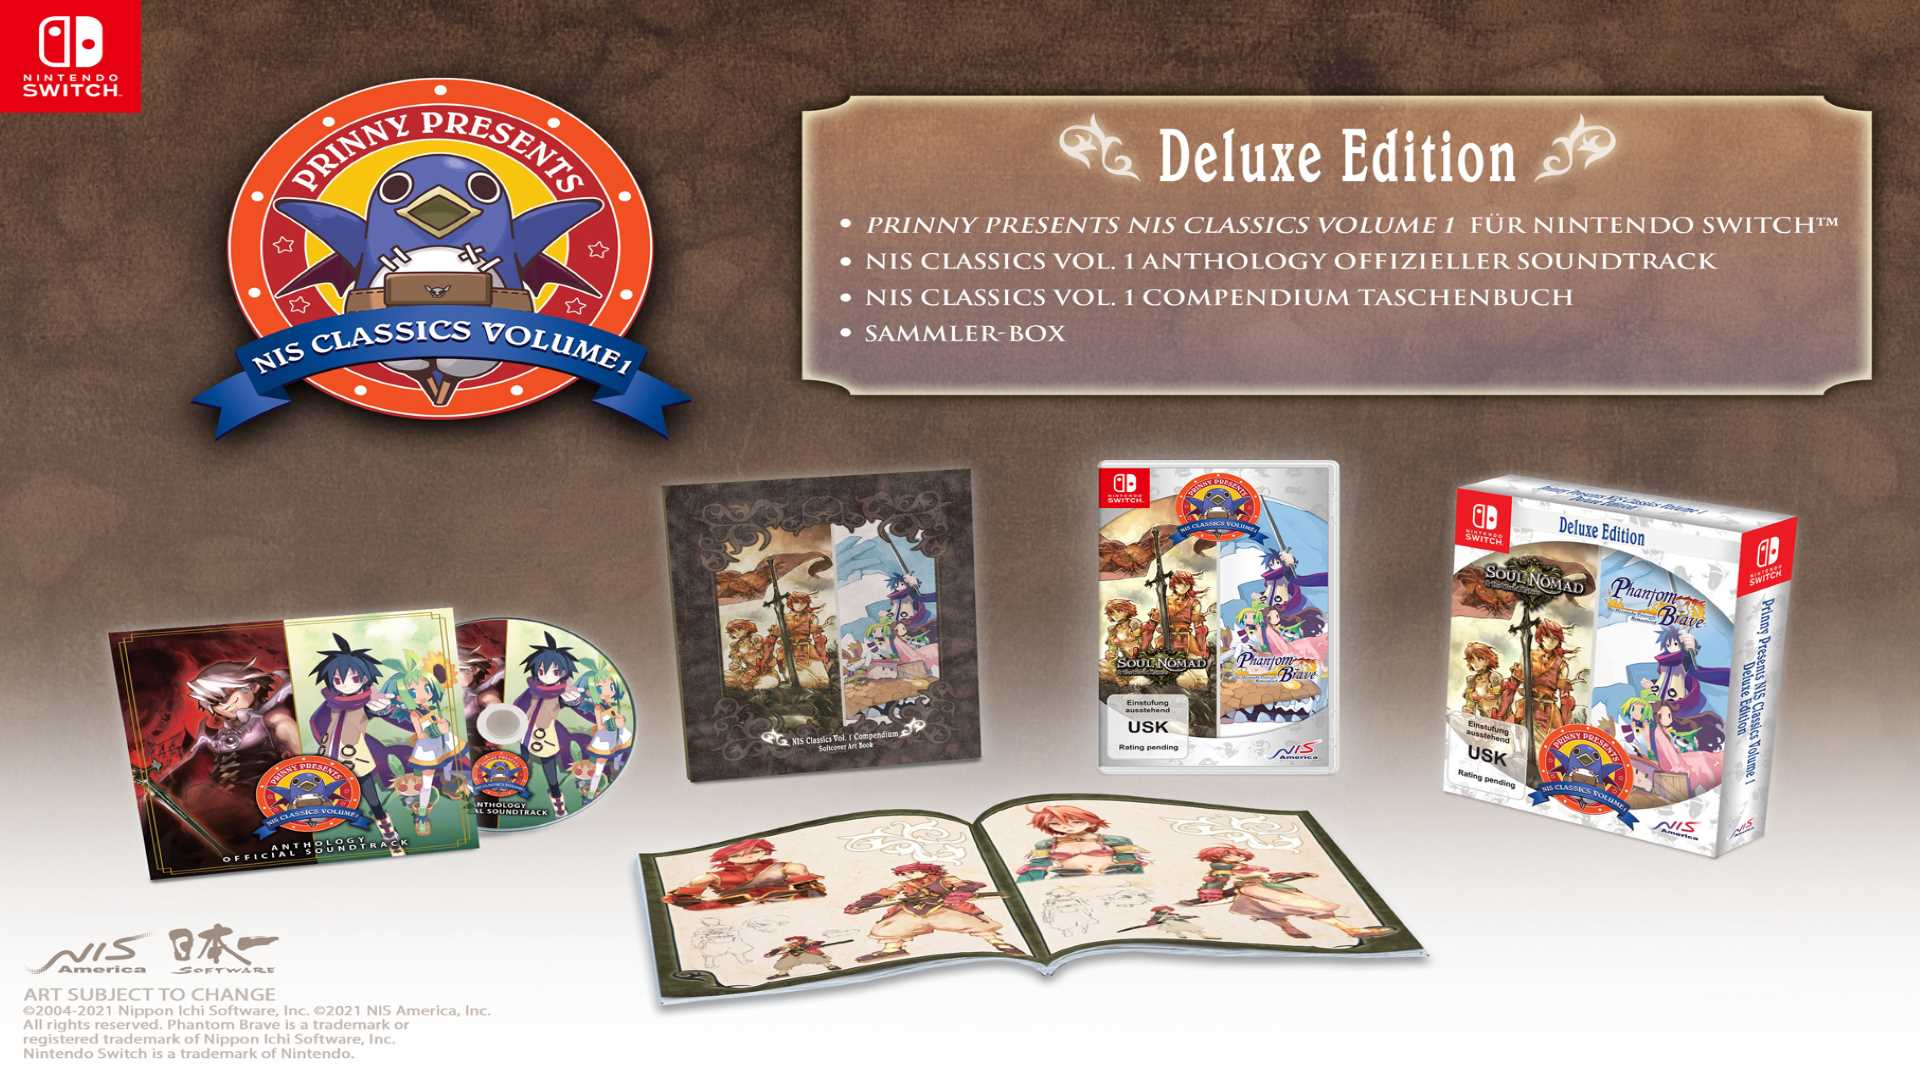 NIS Classics Volume 1 Veröffentlichungsdatum - Deluxe Edition